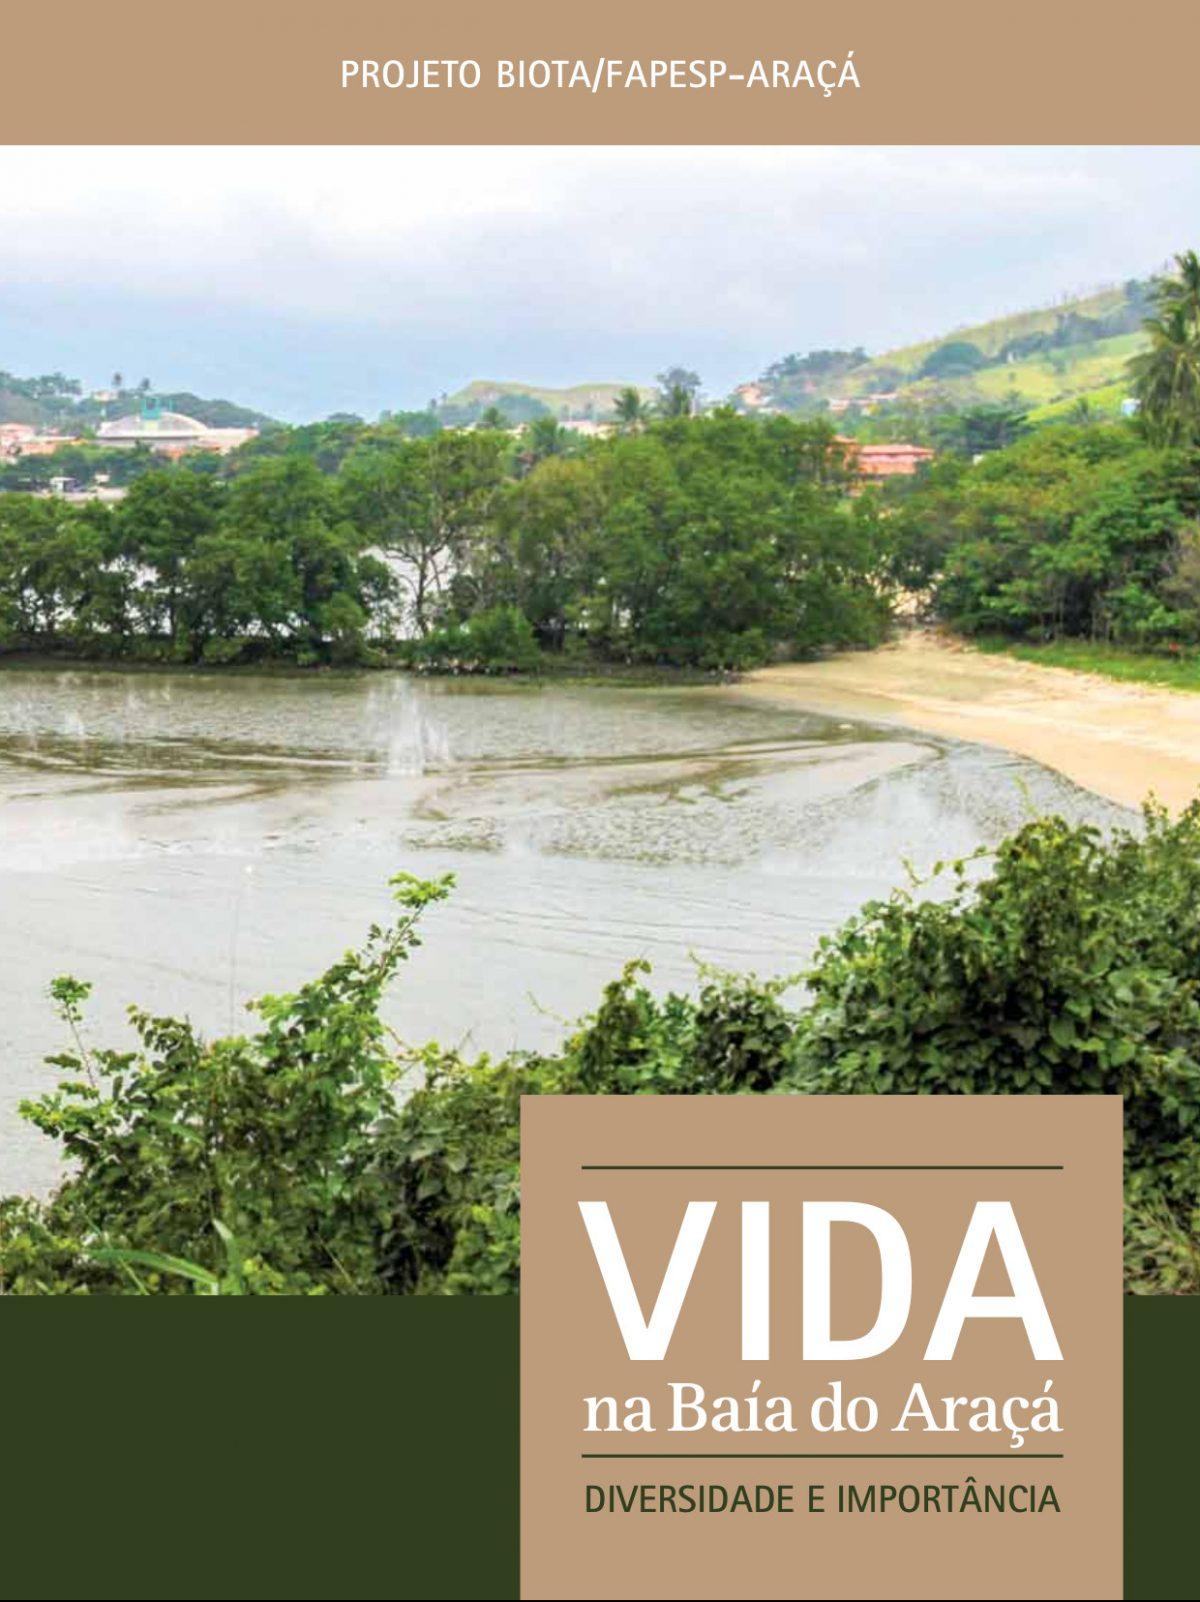 VidaNaBaiaDoAraca 1 e1607725335691